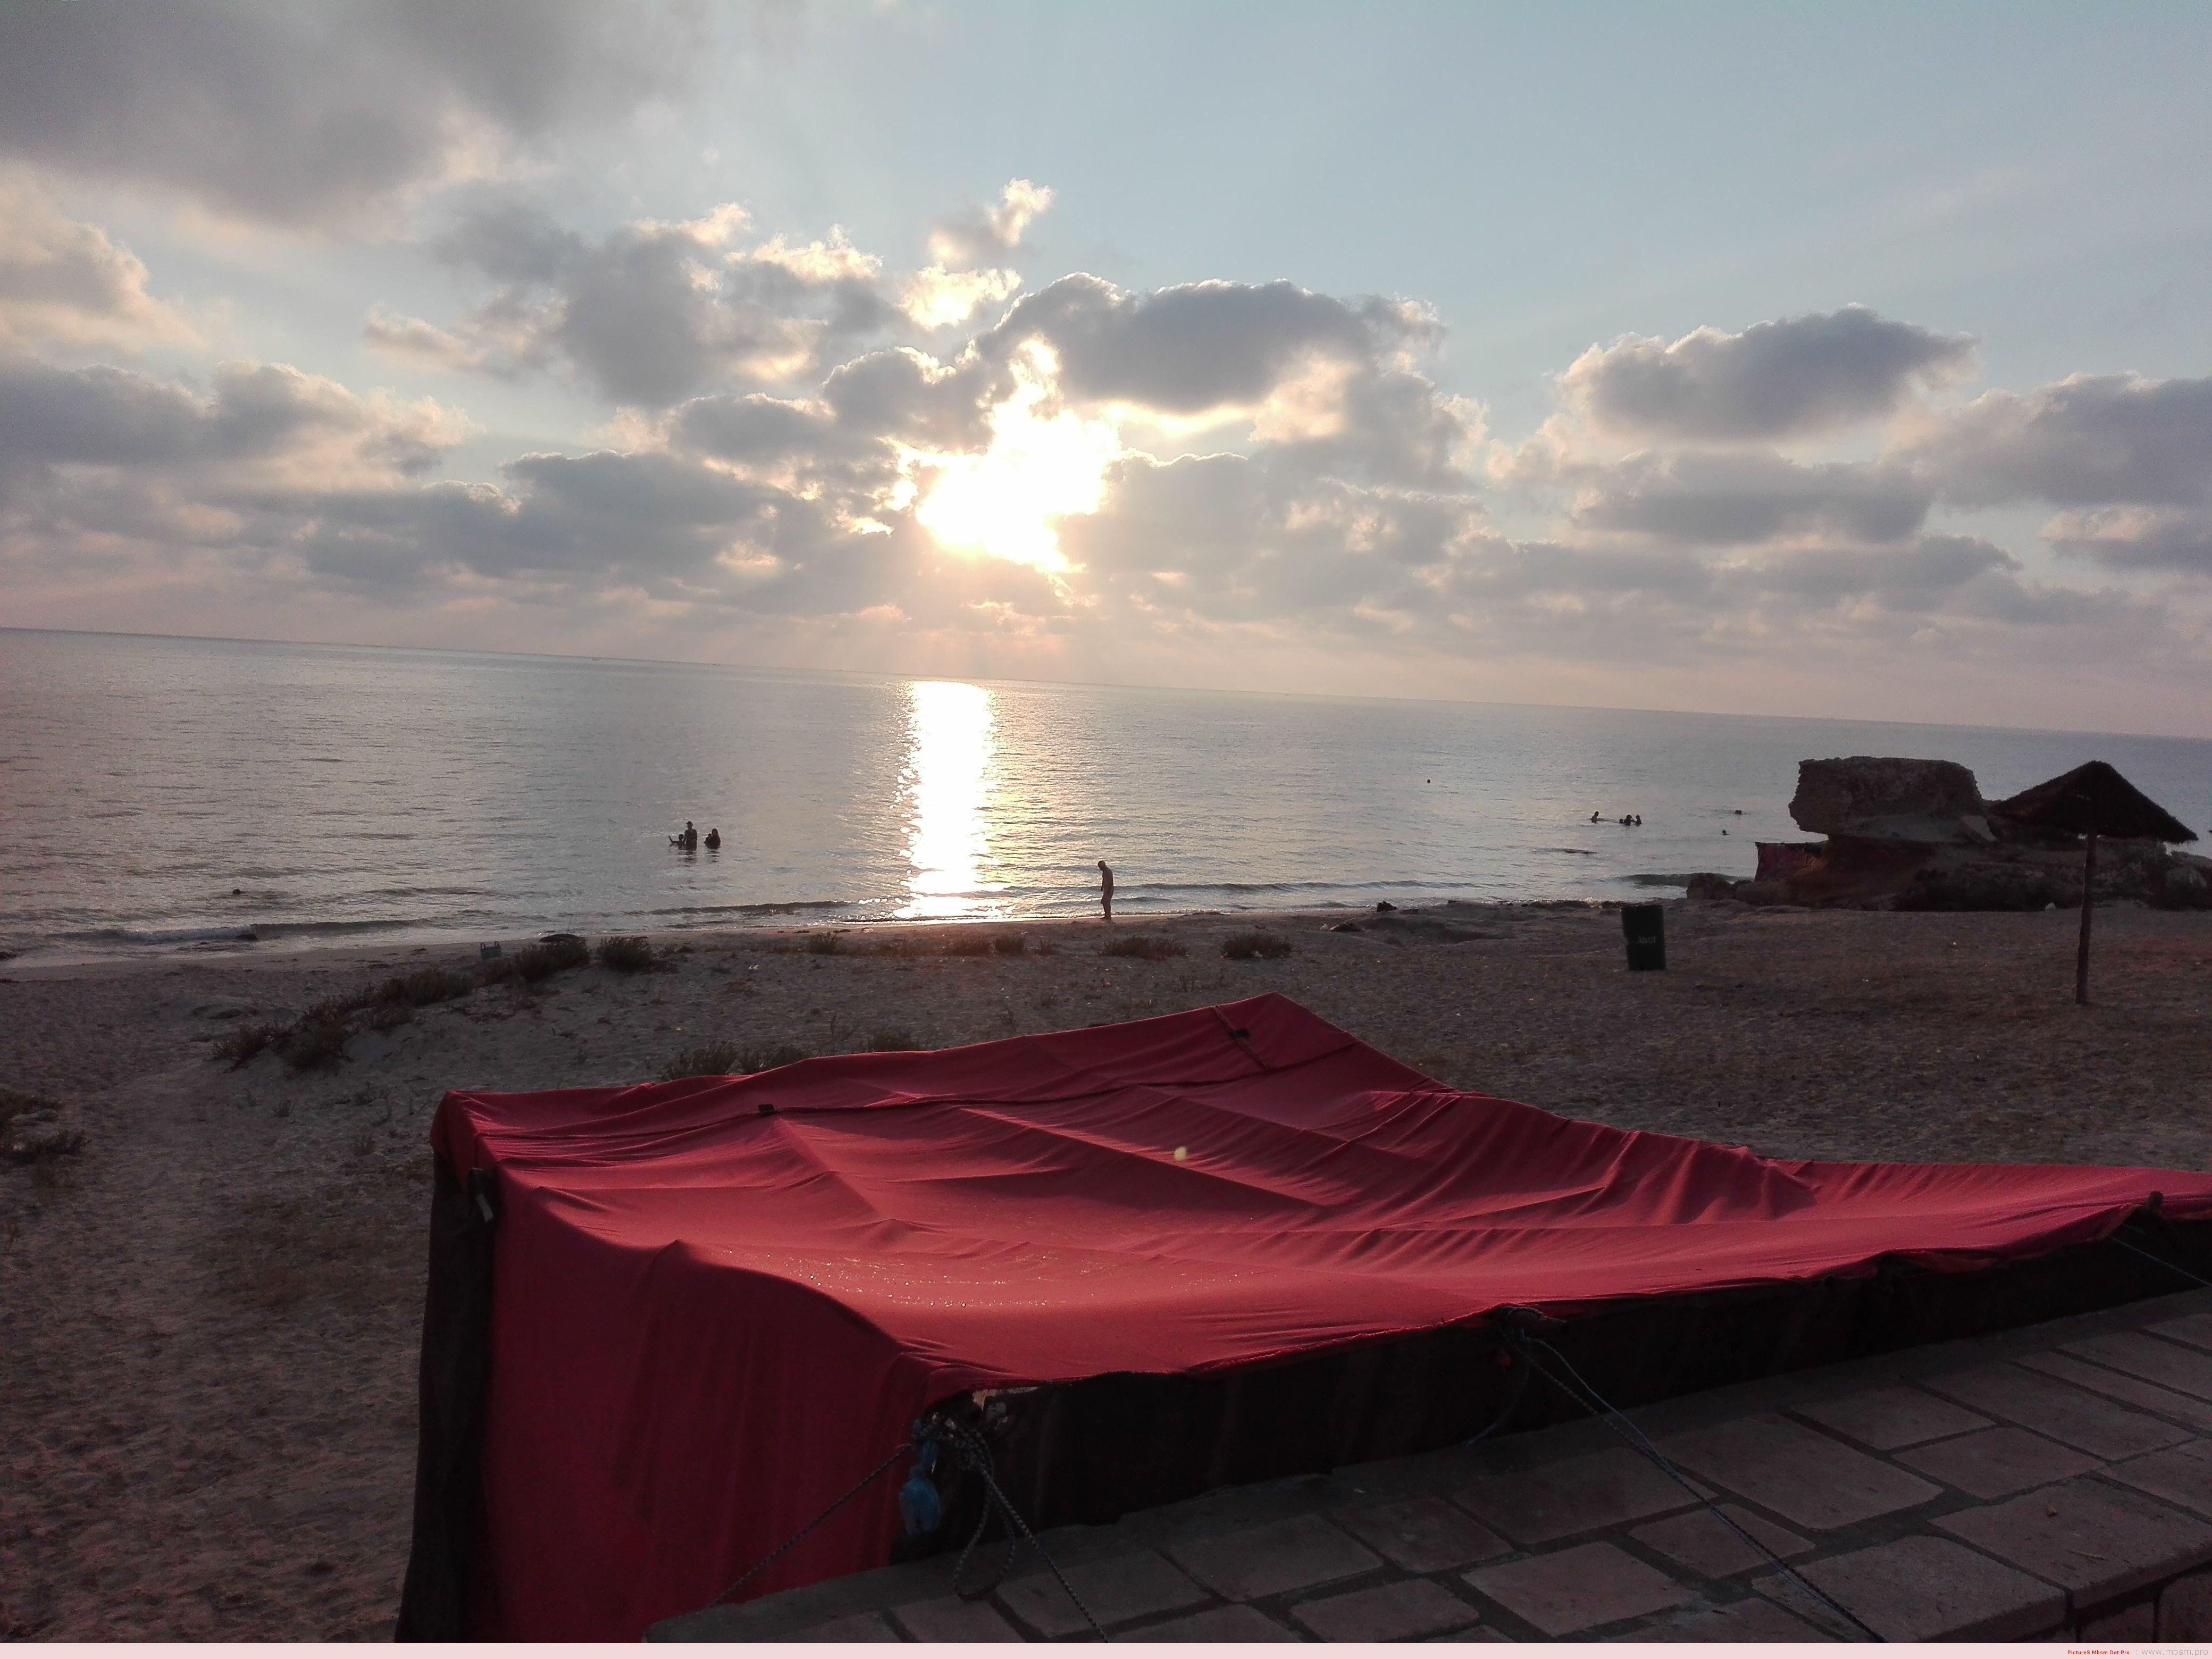 mbsm-dot-pro-mbsm-pro--images-de-plage--chebba--mahdia--tunisia--aot-2018